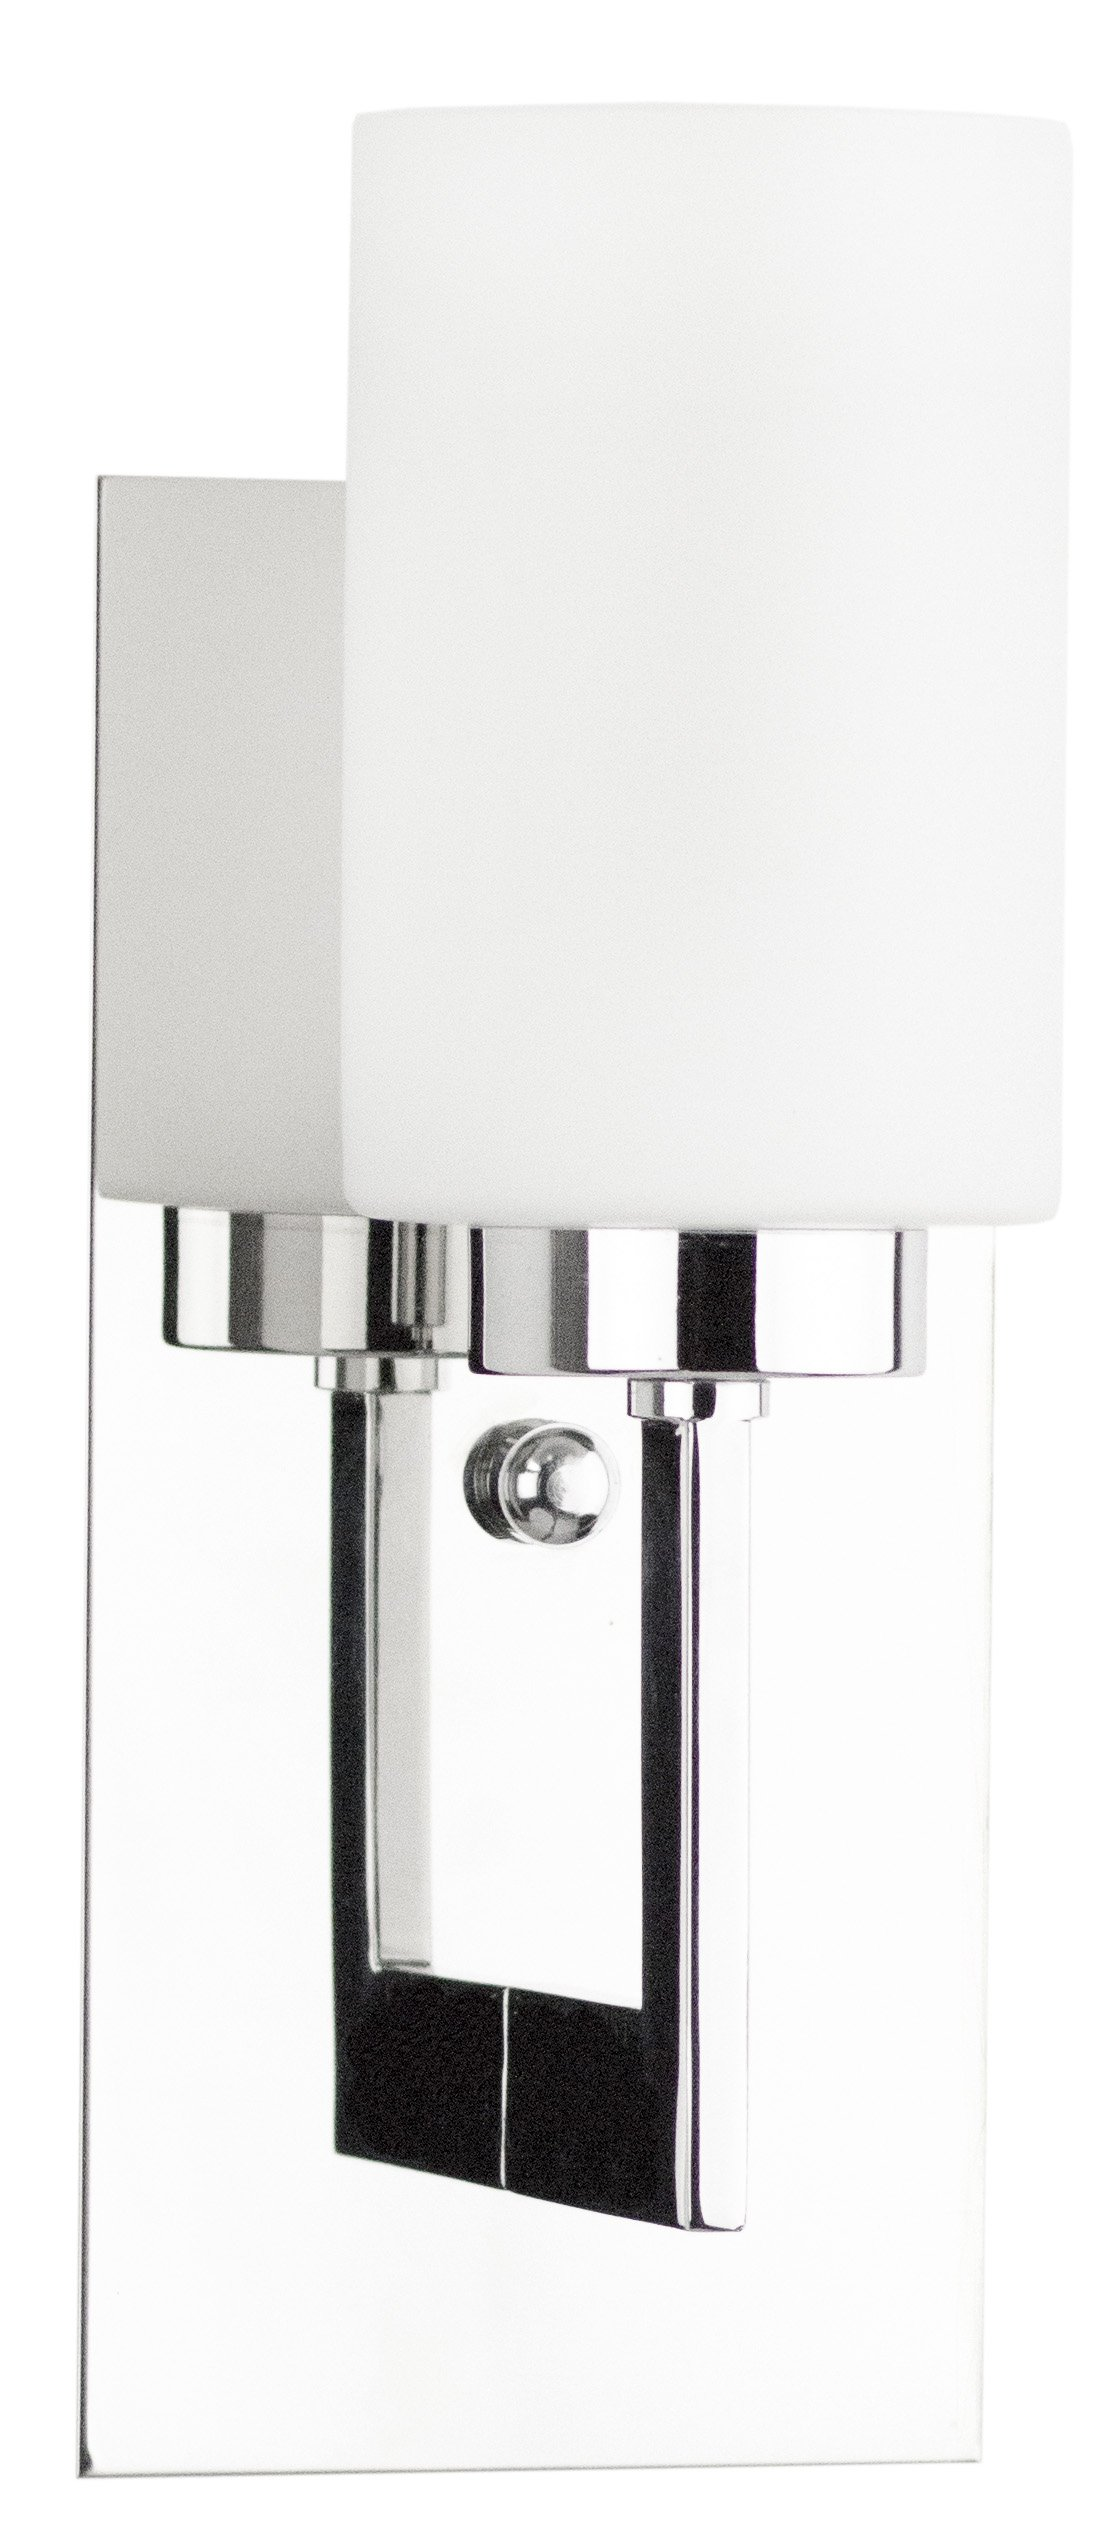 Best Rated in Vanity Lighting Fixtures & Helpful Customer Reviews